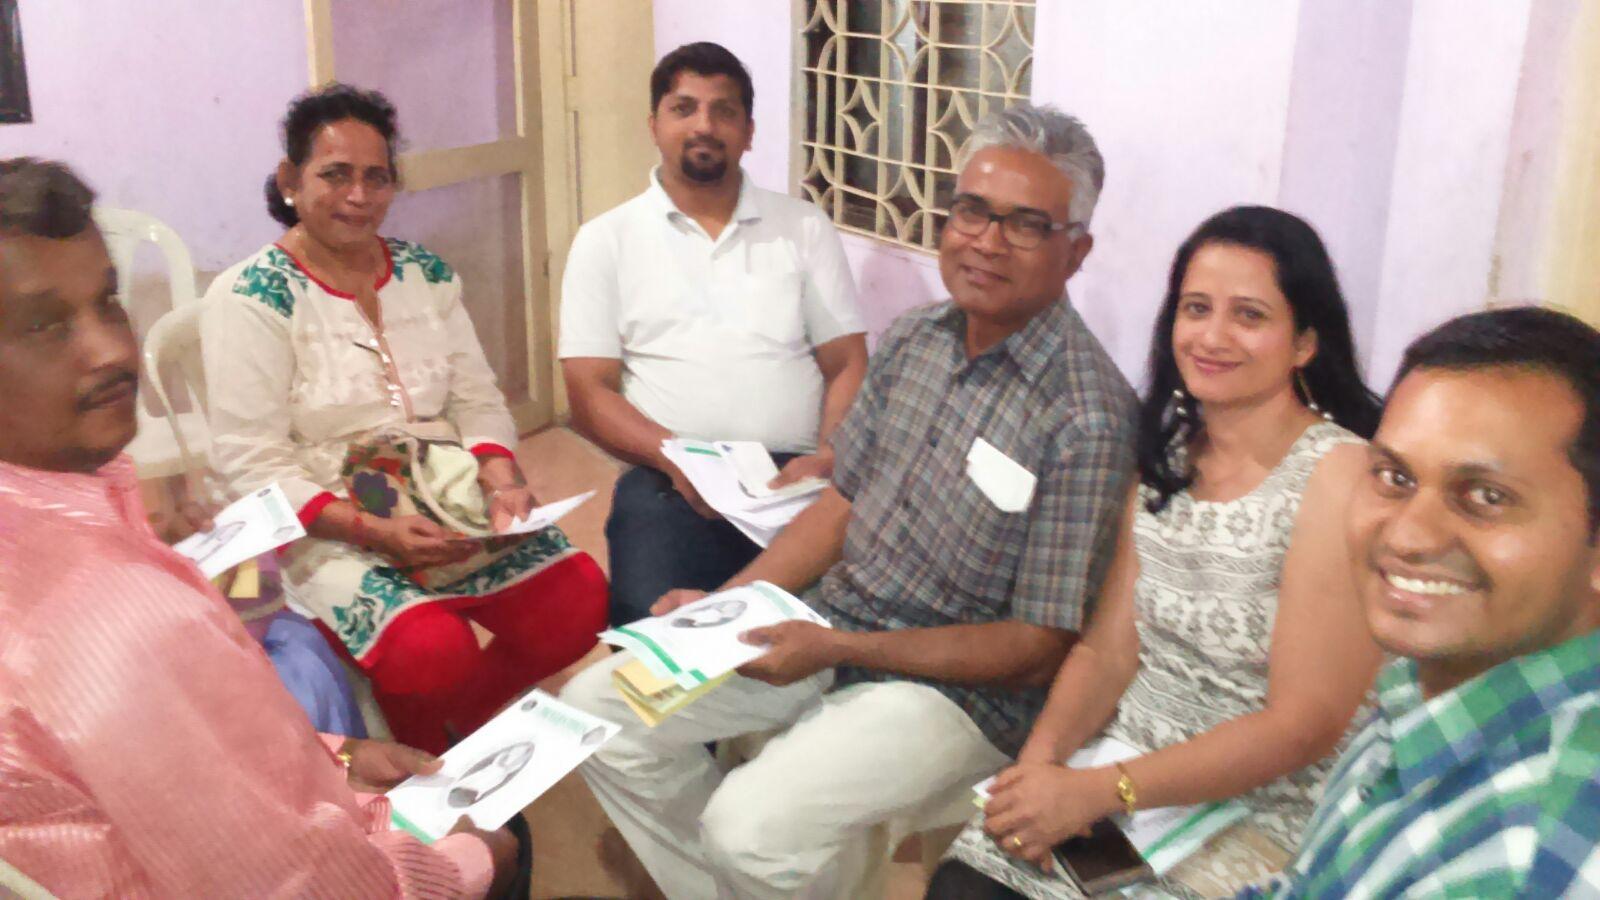 Training Session at St. Francis Xavier Church, Badlapur